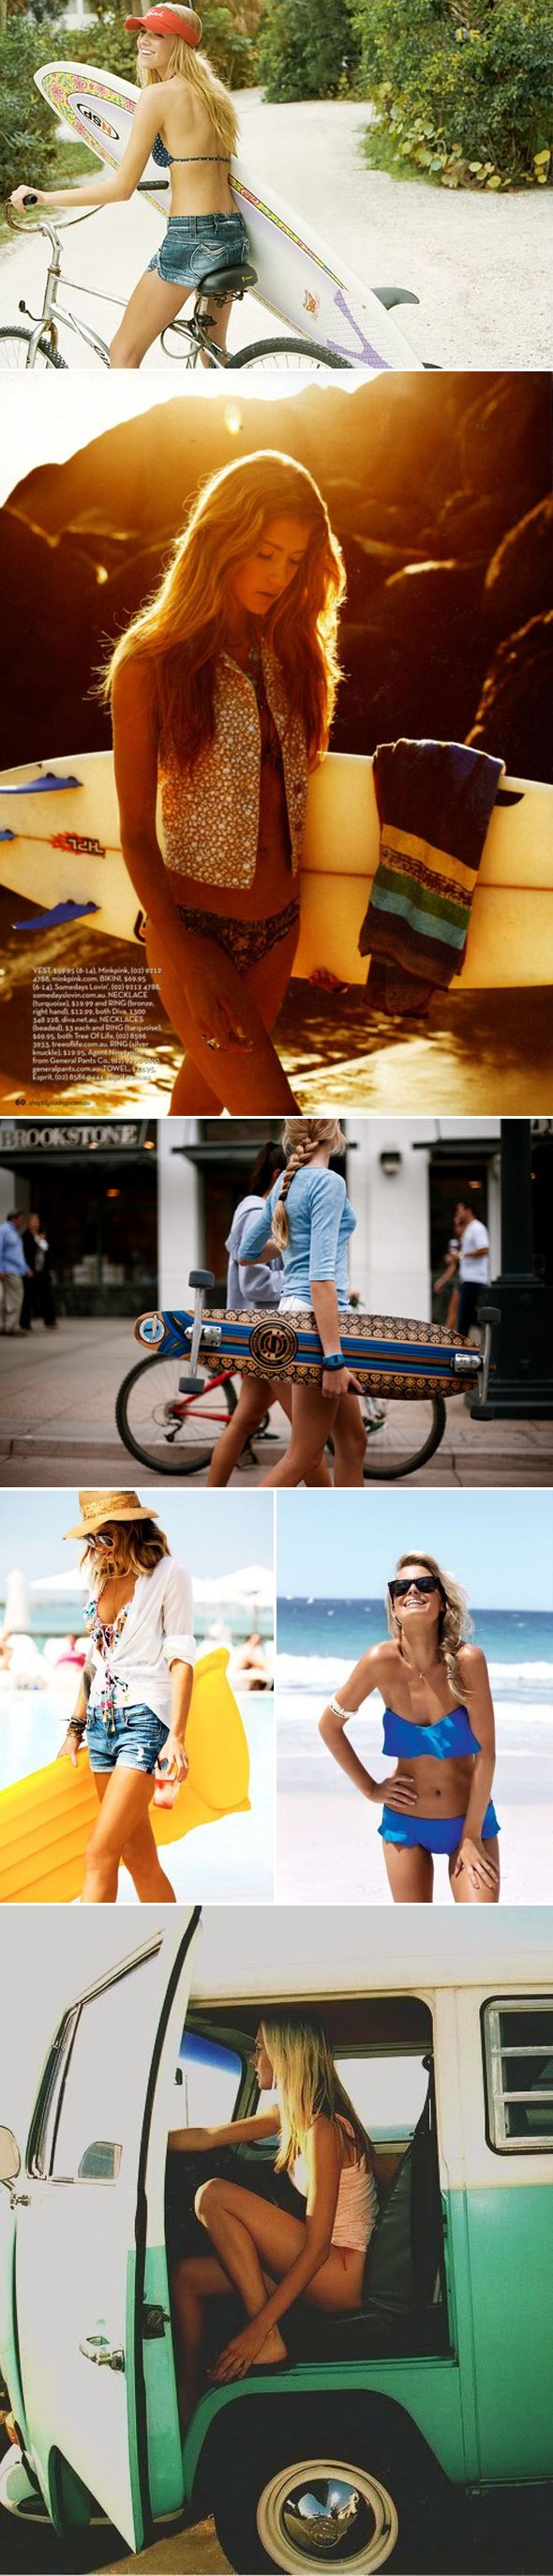 The Style Umbrella - http://www.thestyleumbrella.com/2012/07/10/surfer-girl-style/